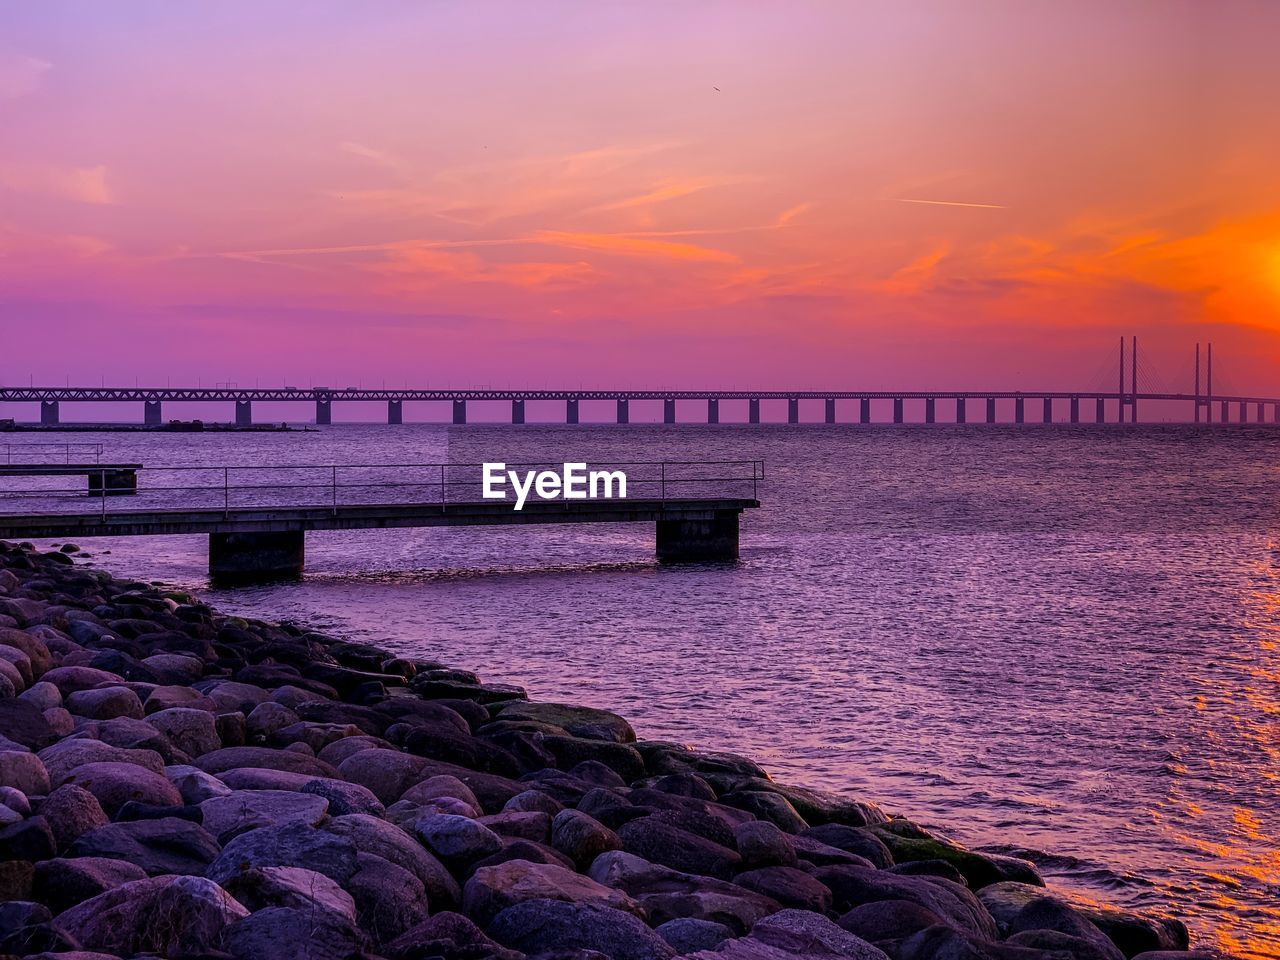 sky, sunset, water, beauty in nature, scenics - nature, sea, cloud - sky, orange color, nature, tranquil scene, tranquility, idyllic, pier, rock, built structure, bridge, no people, rock - object, solid, purple, groyne